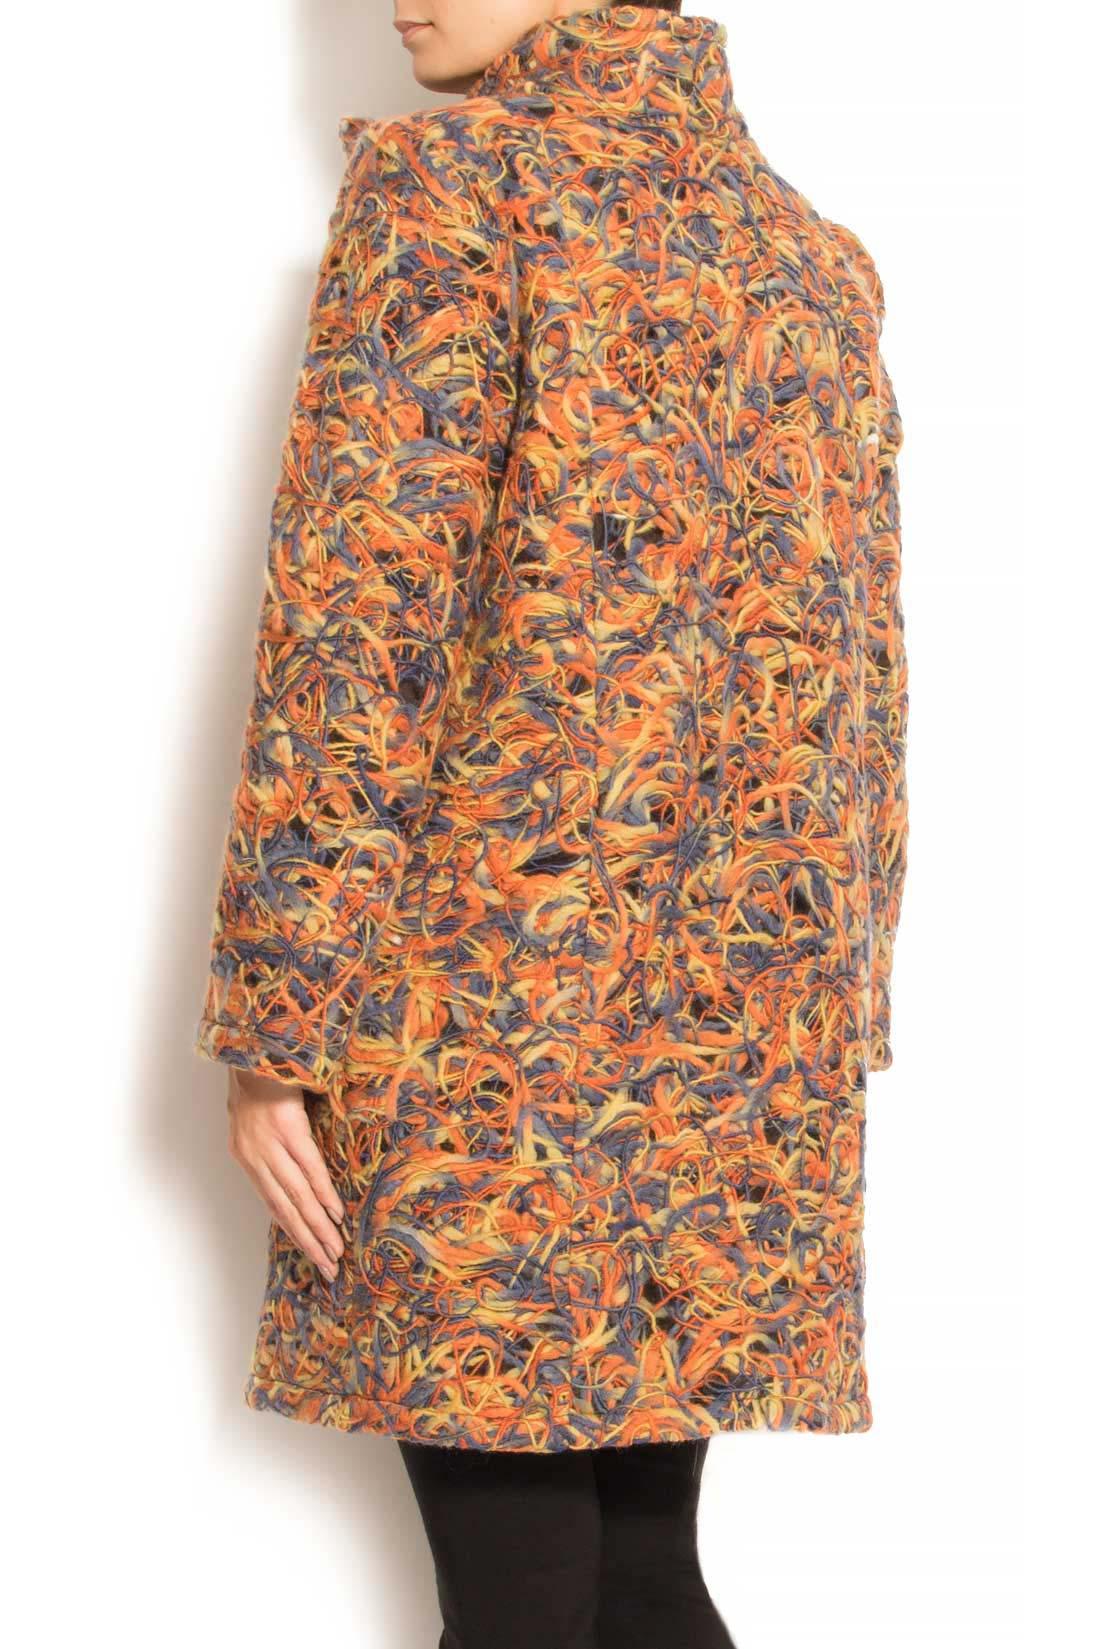 Palton din lana cu buzunare laterale Arina Varga imagine 2